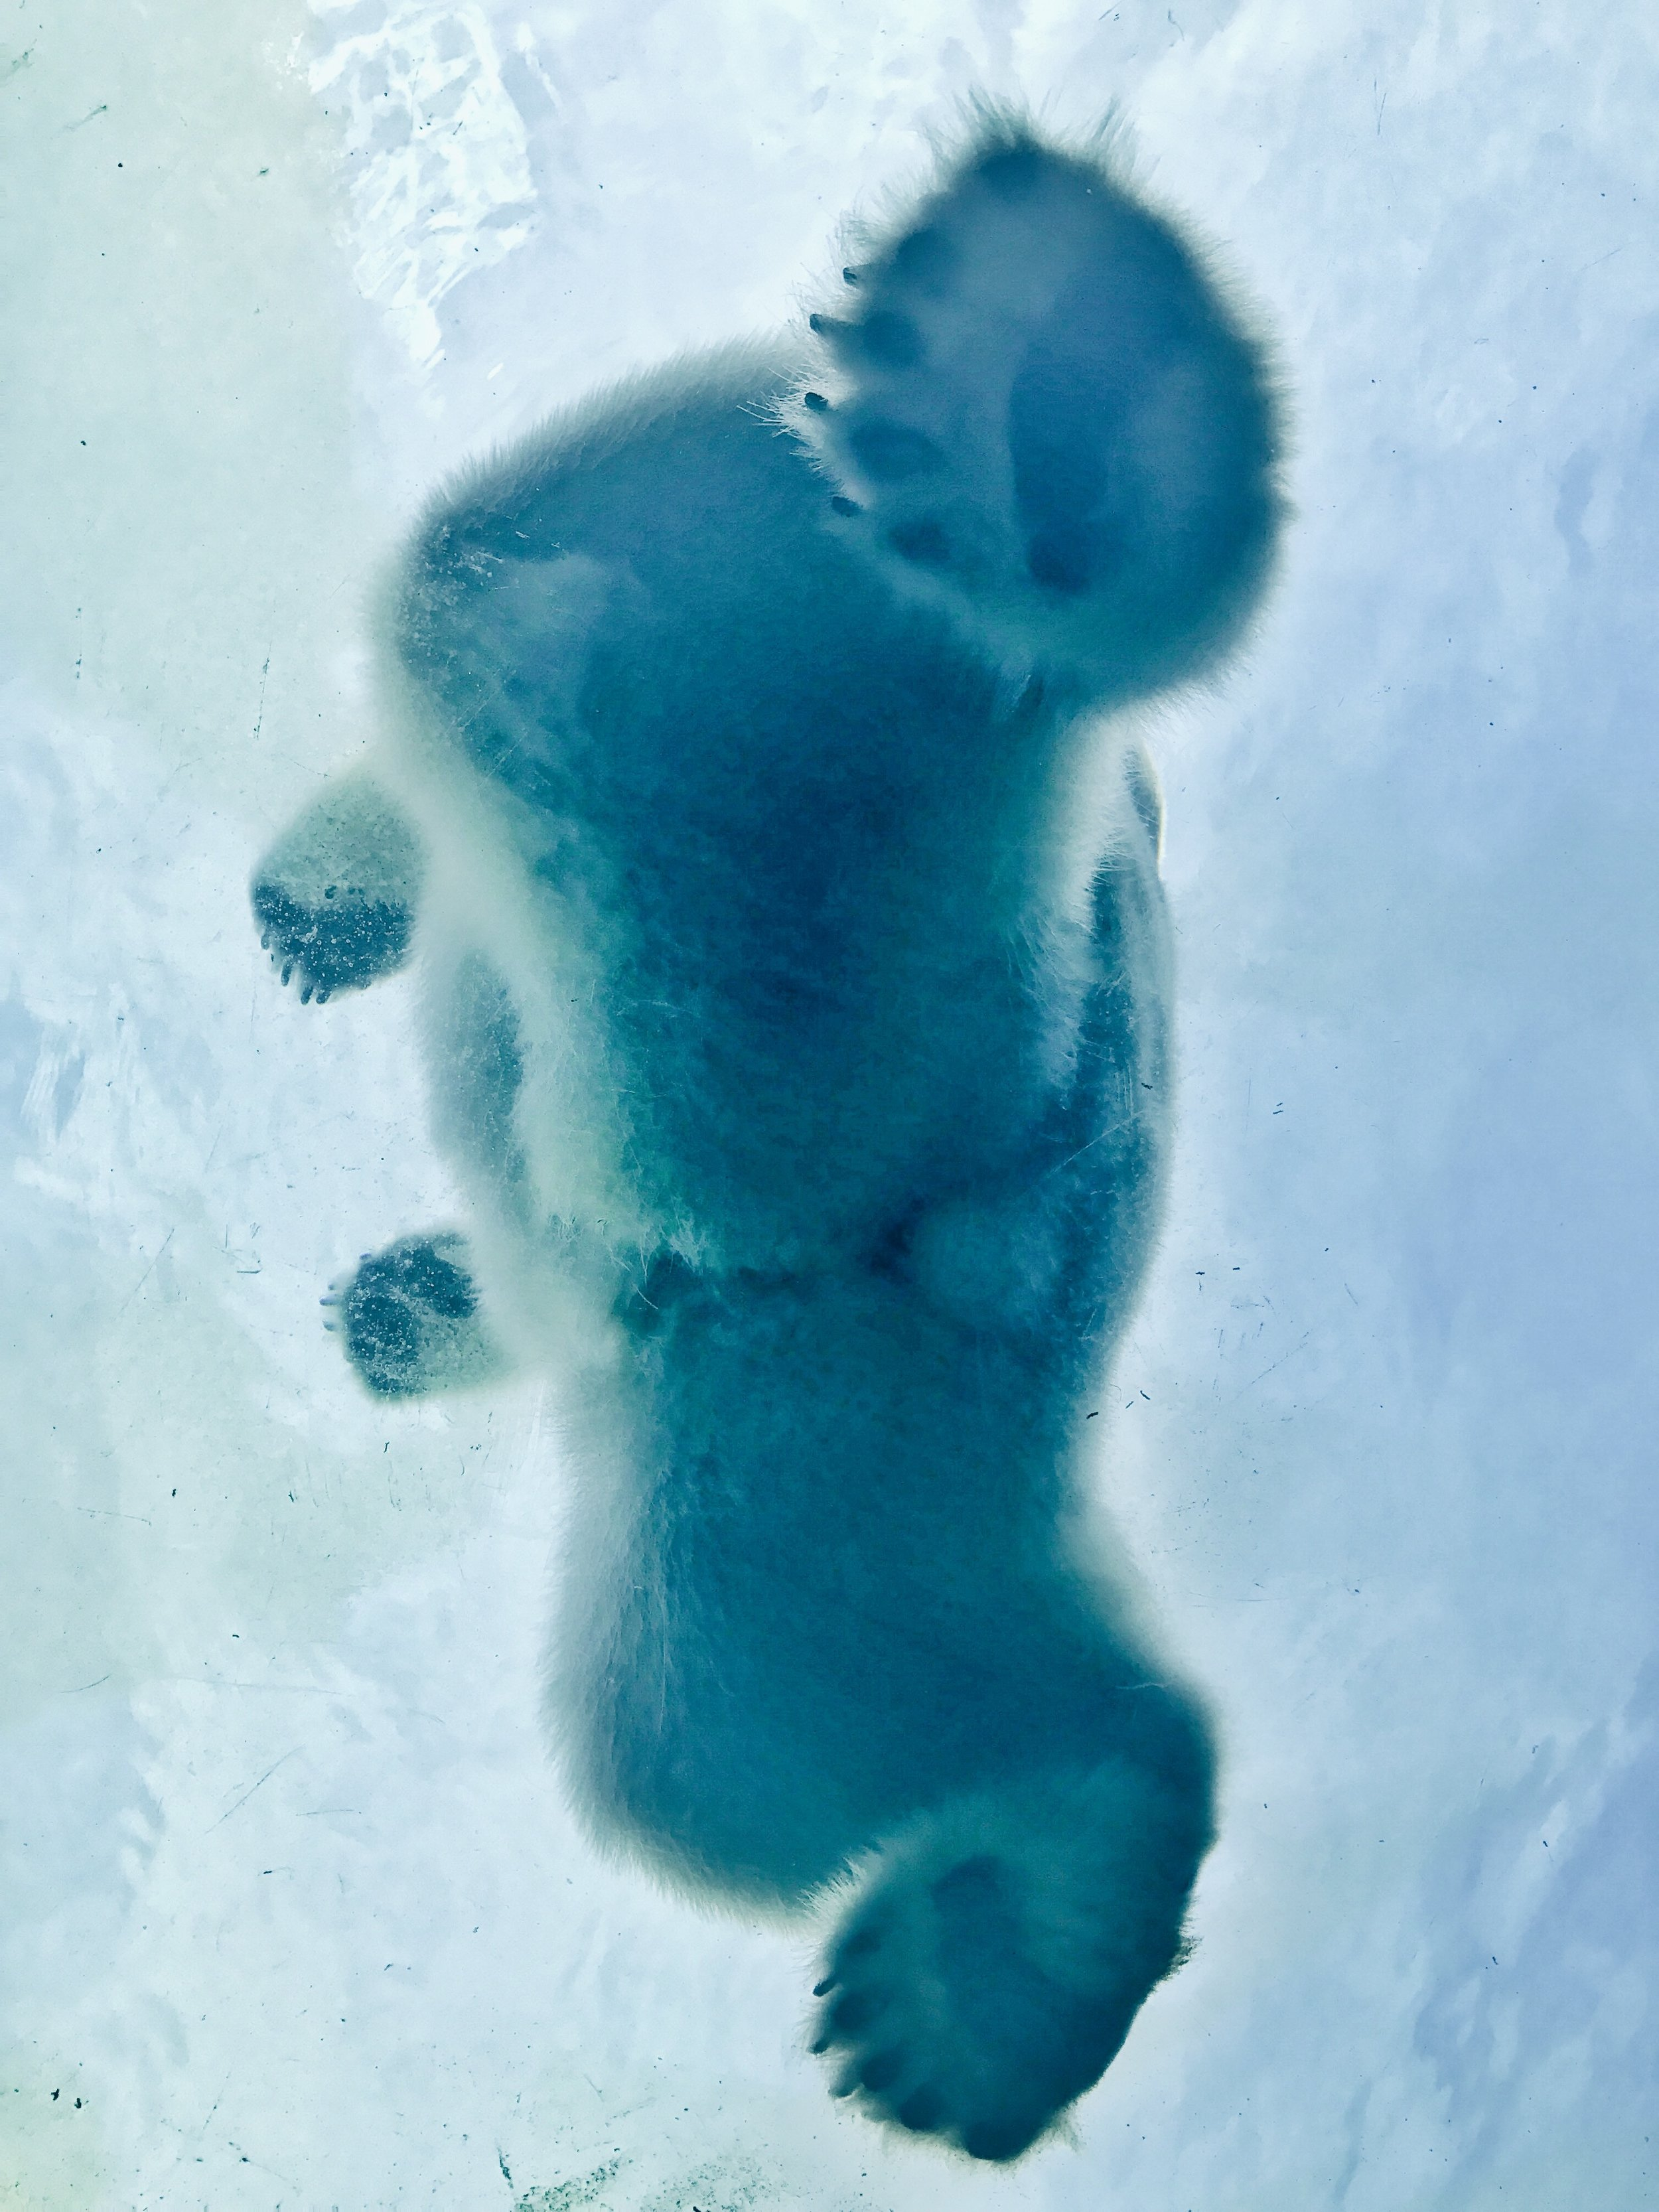 carlos-breton Polar Bear under the Ice Arctic Up cL.jpg